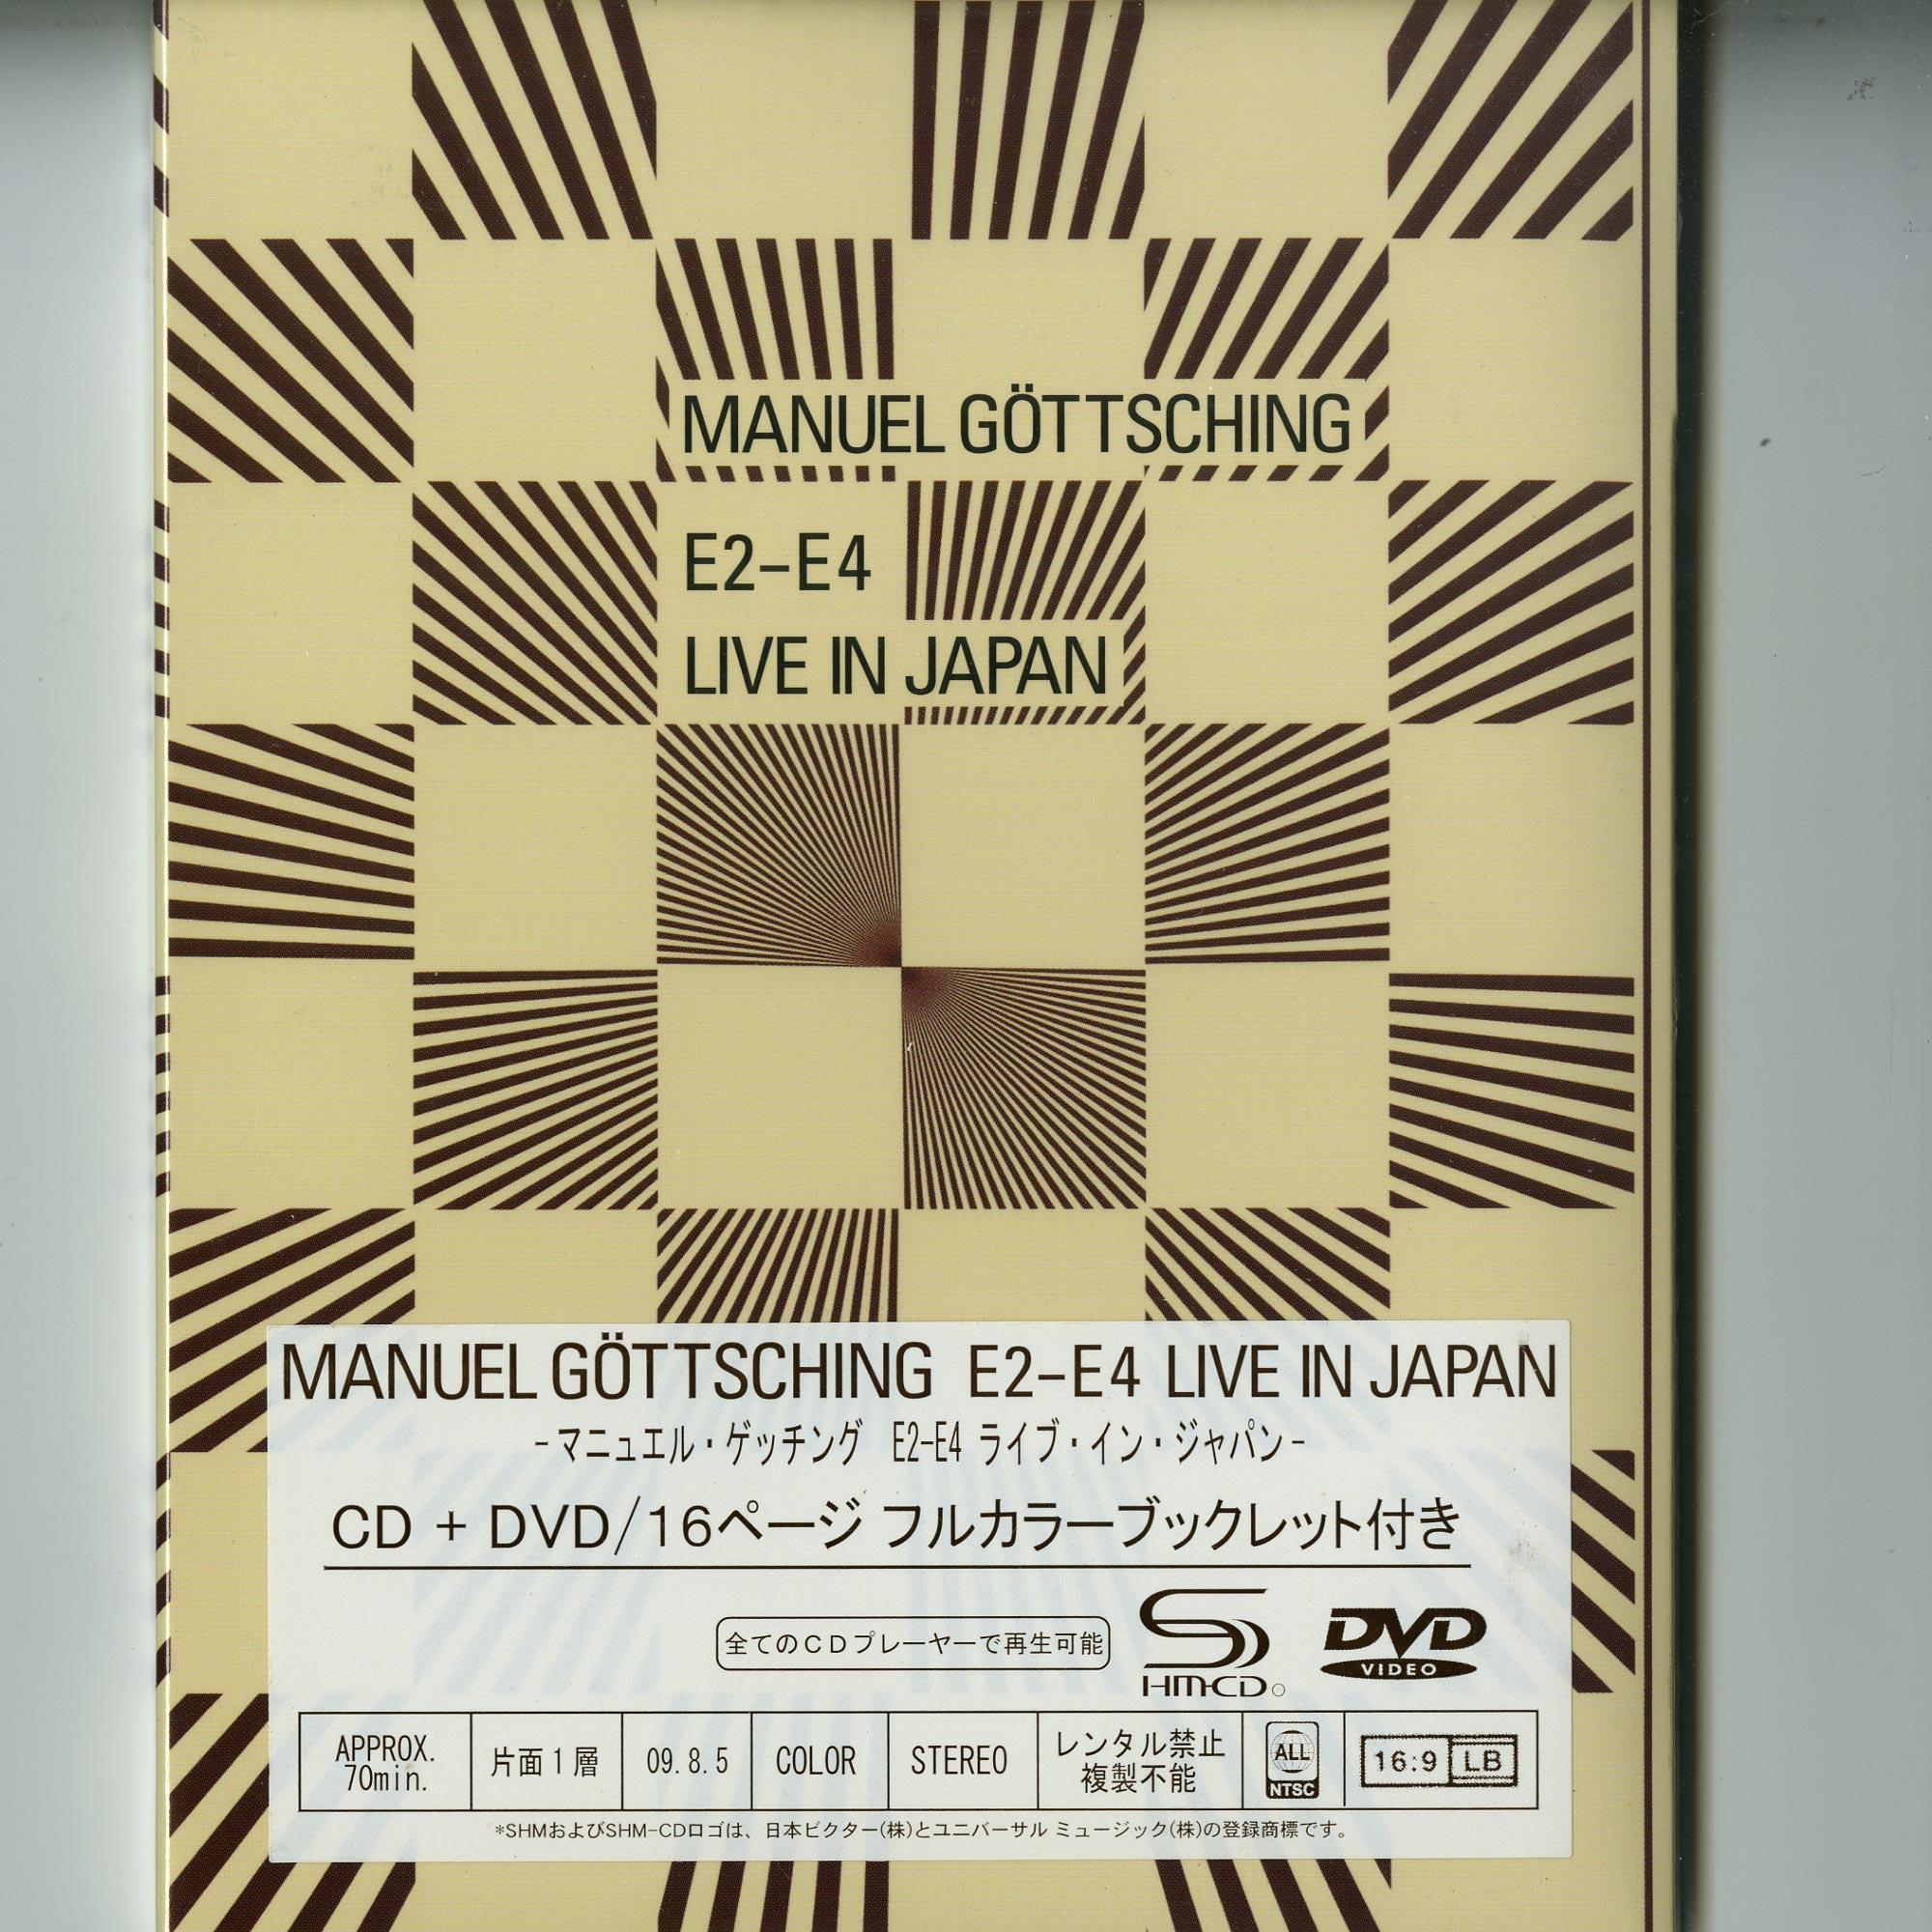 Manuel Goettsching - E2E4 LIVE IN JAPAN DVD+CD 16 PAGER